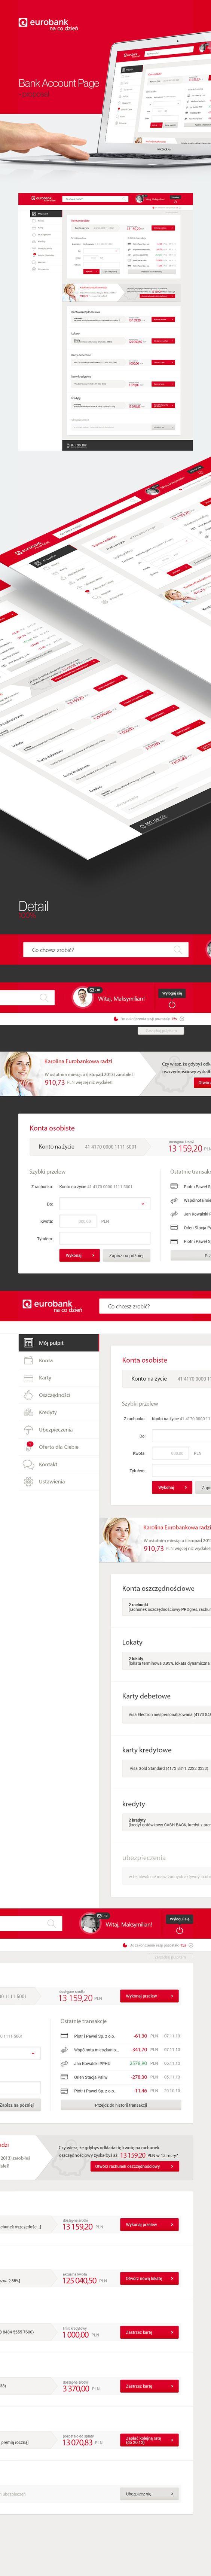 Eurobank - Bank Account Page UI/UX Web Design  by Mateusz Jakobsze, via Behance